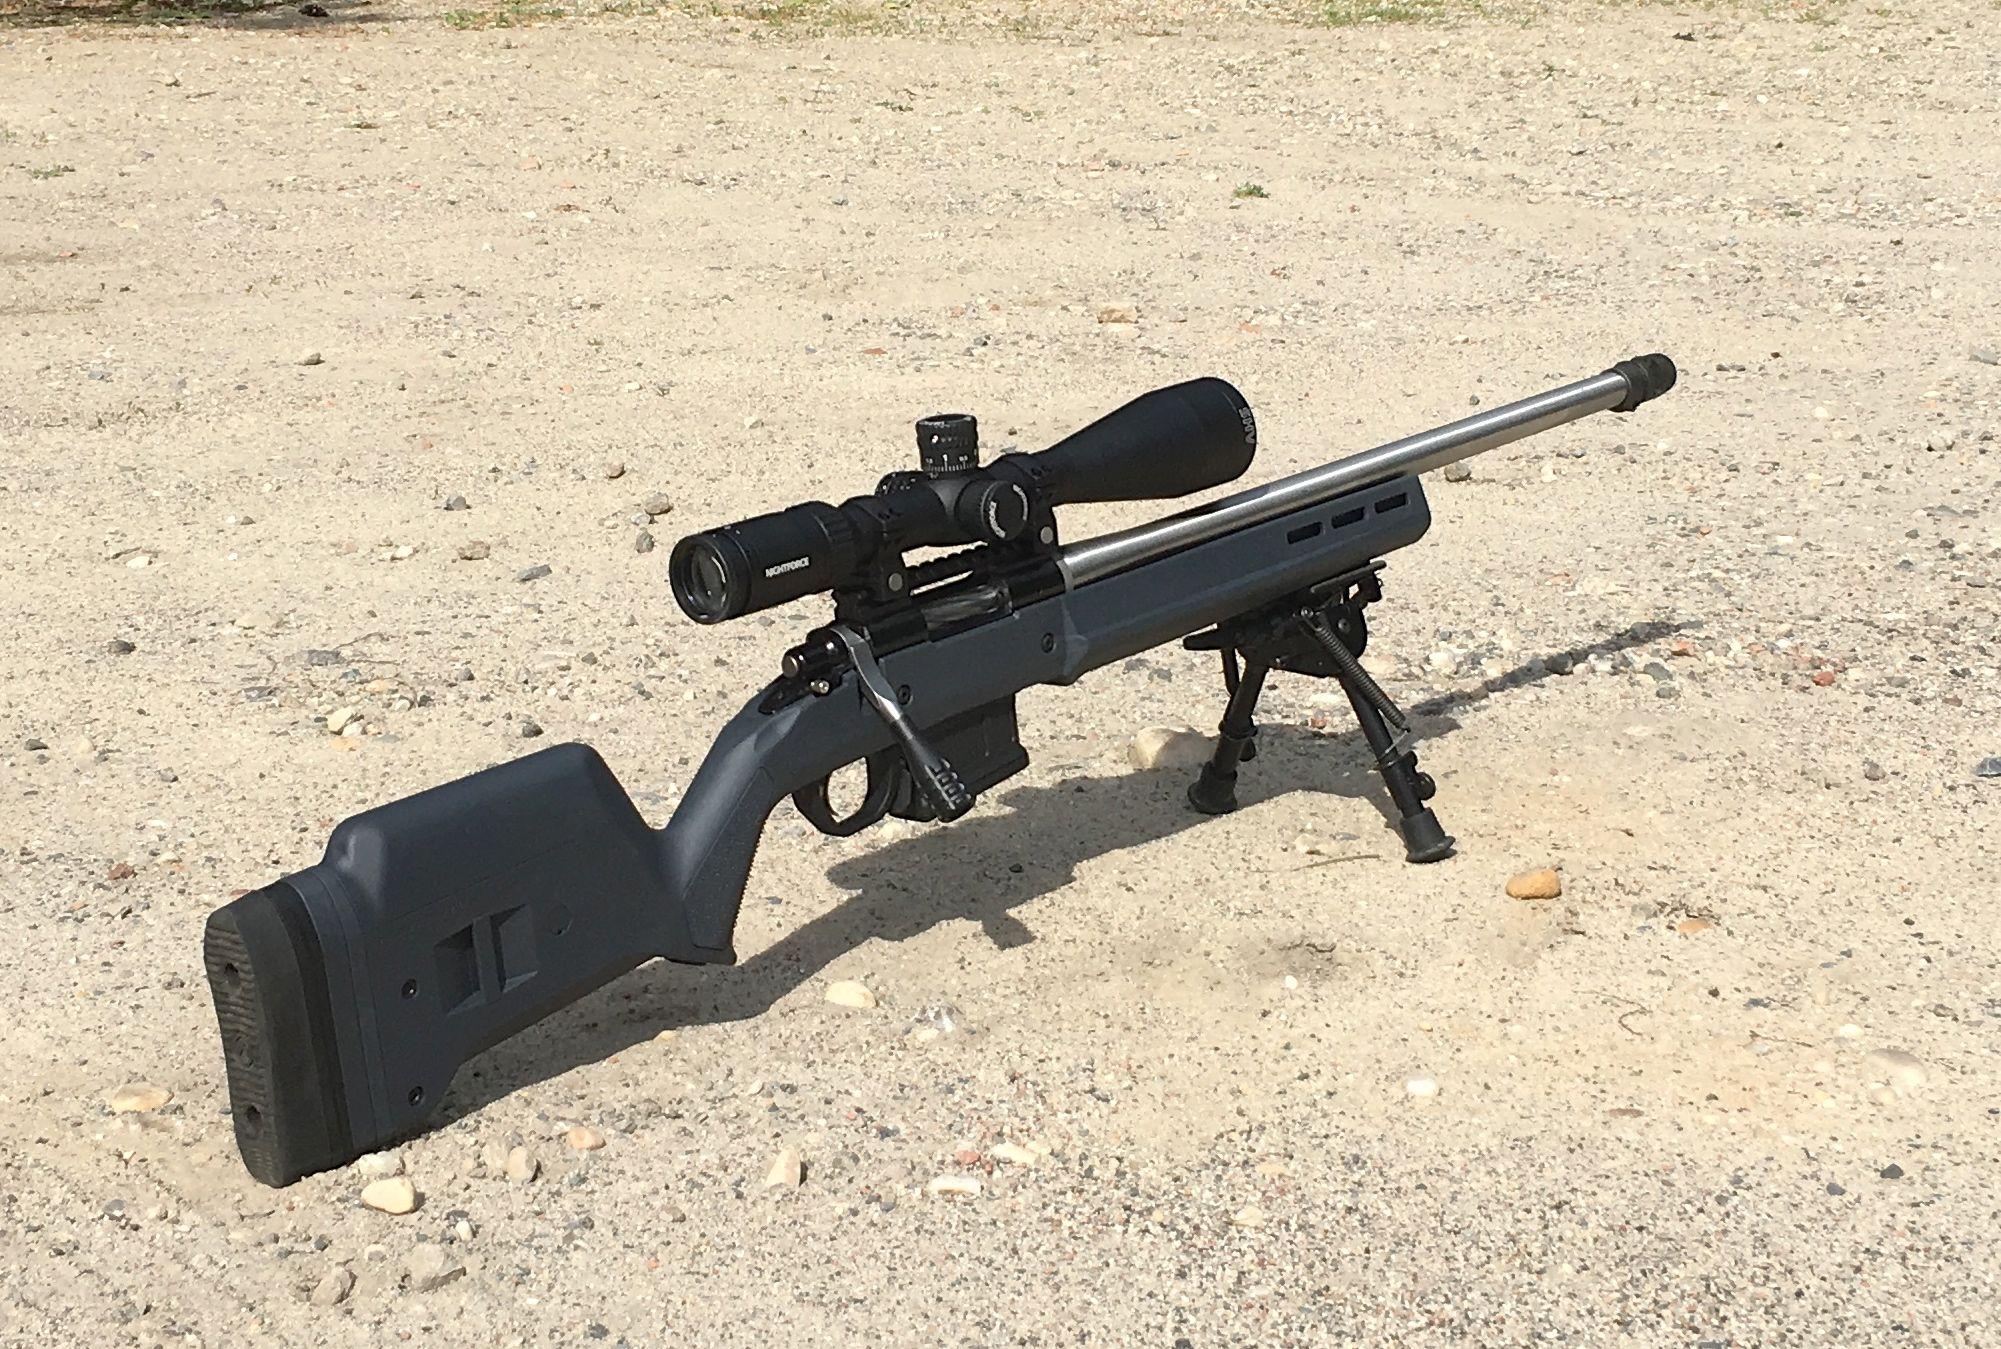 Review Shooting The Magpul Hunter 700 Stock Rifleshooter Com